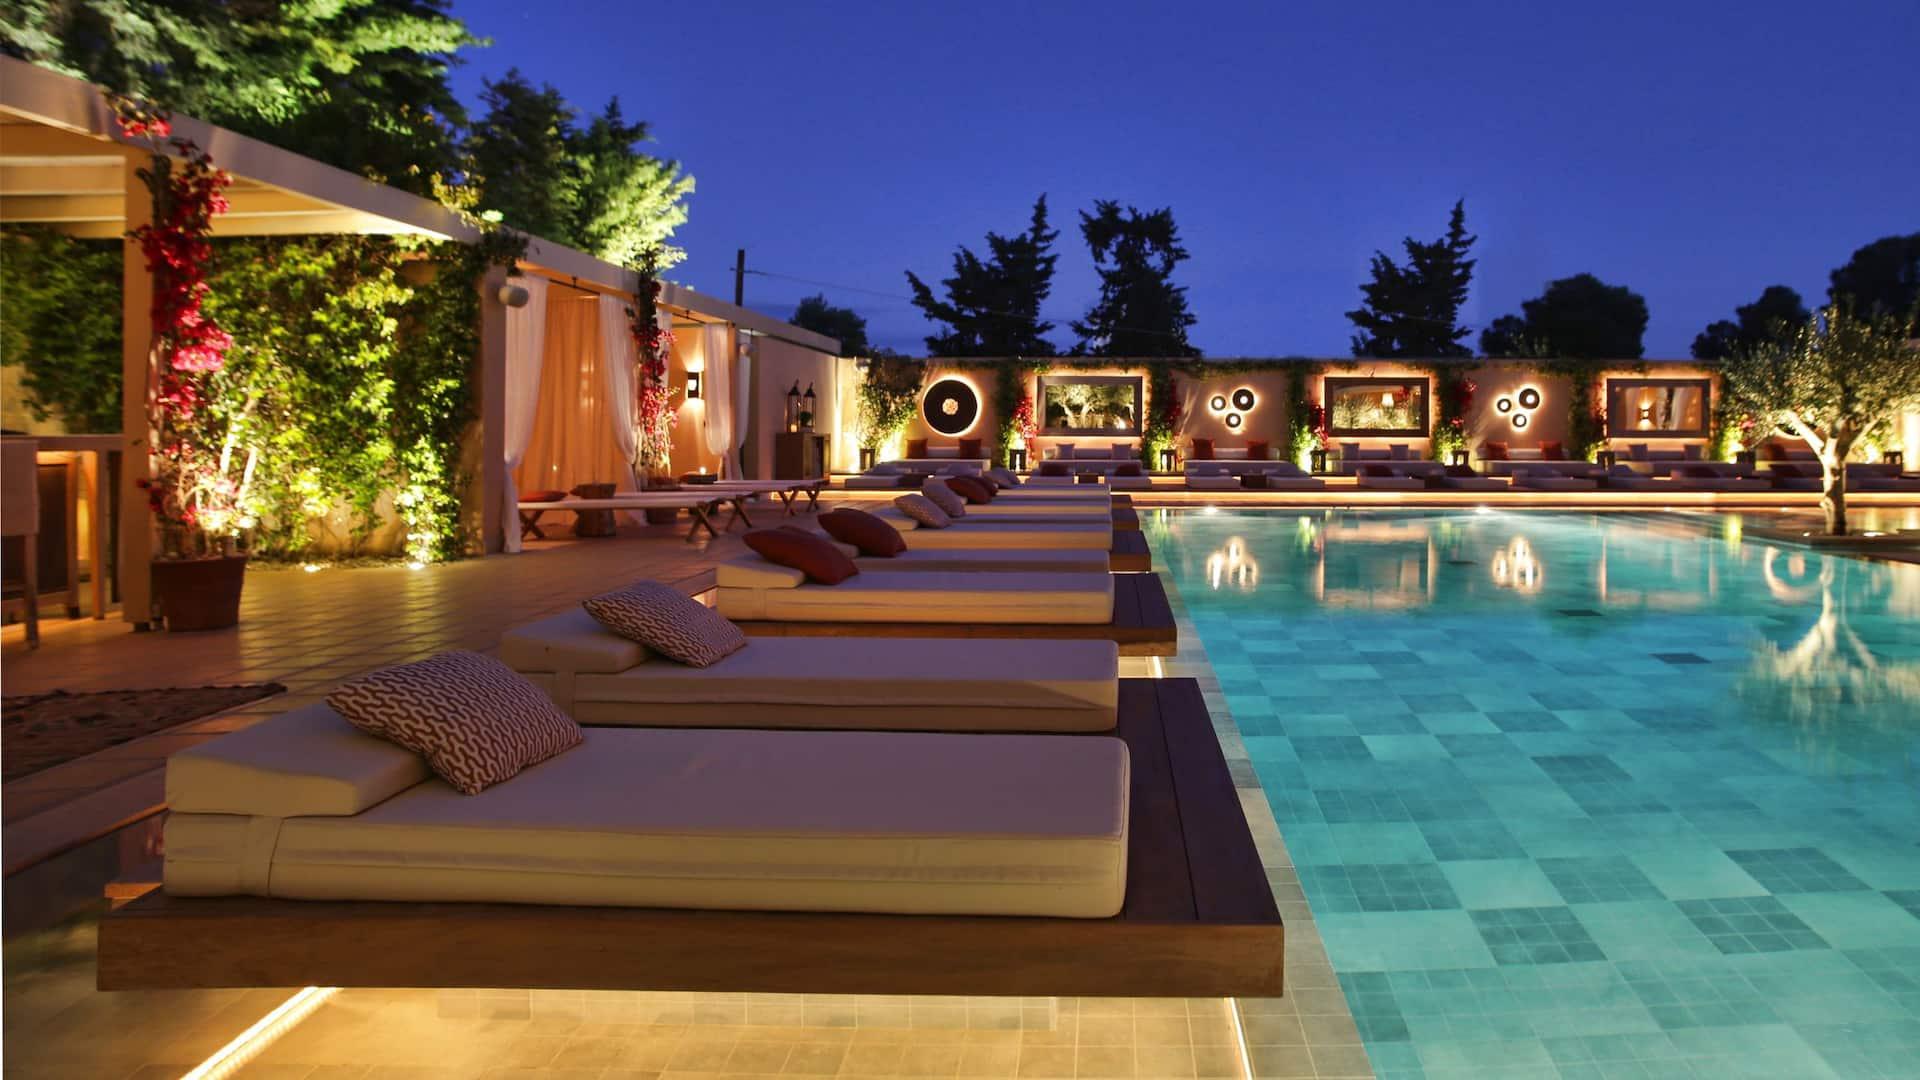 The Margi pool at night